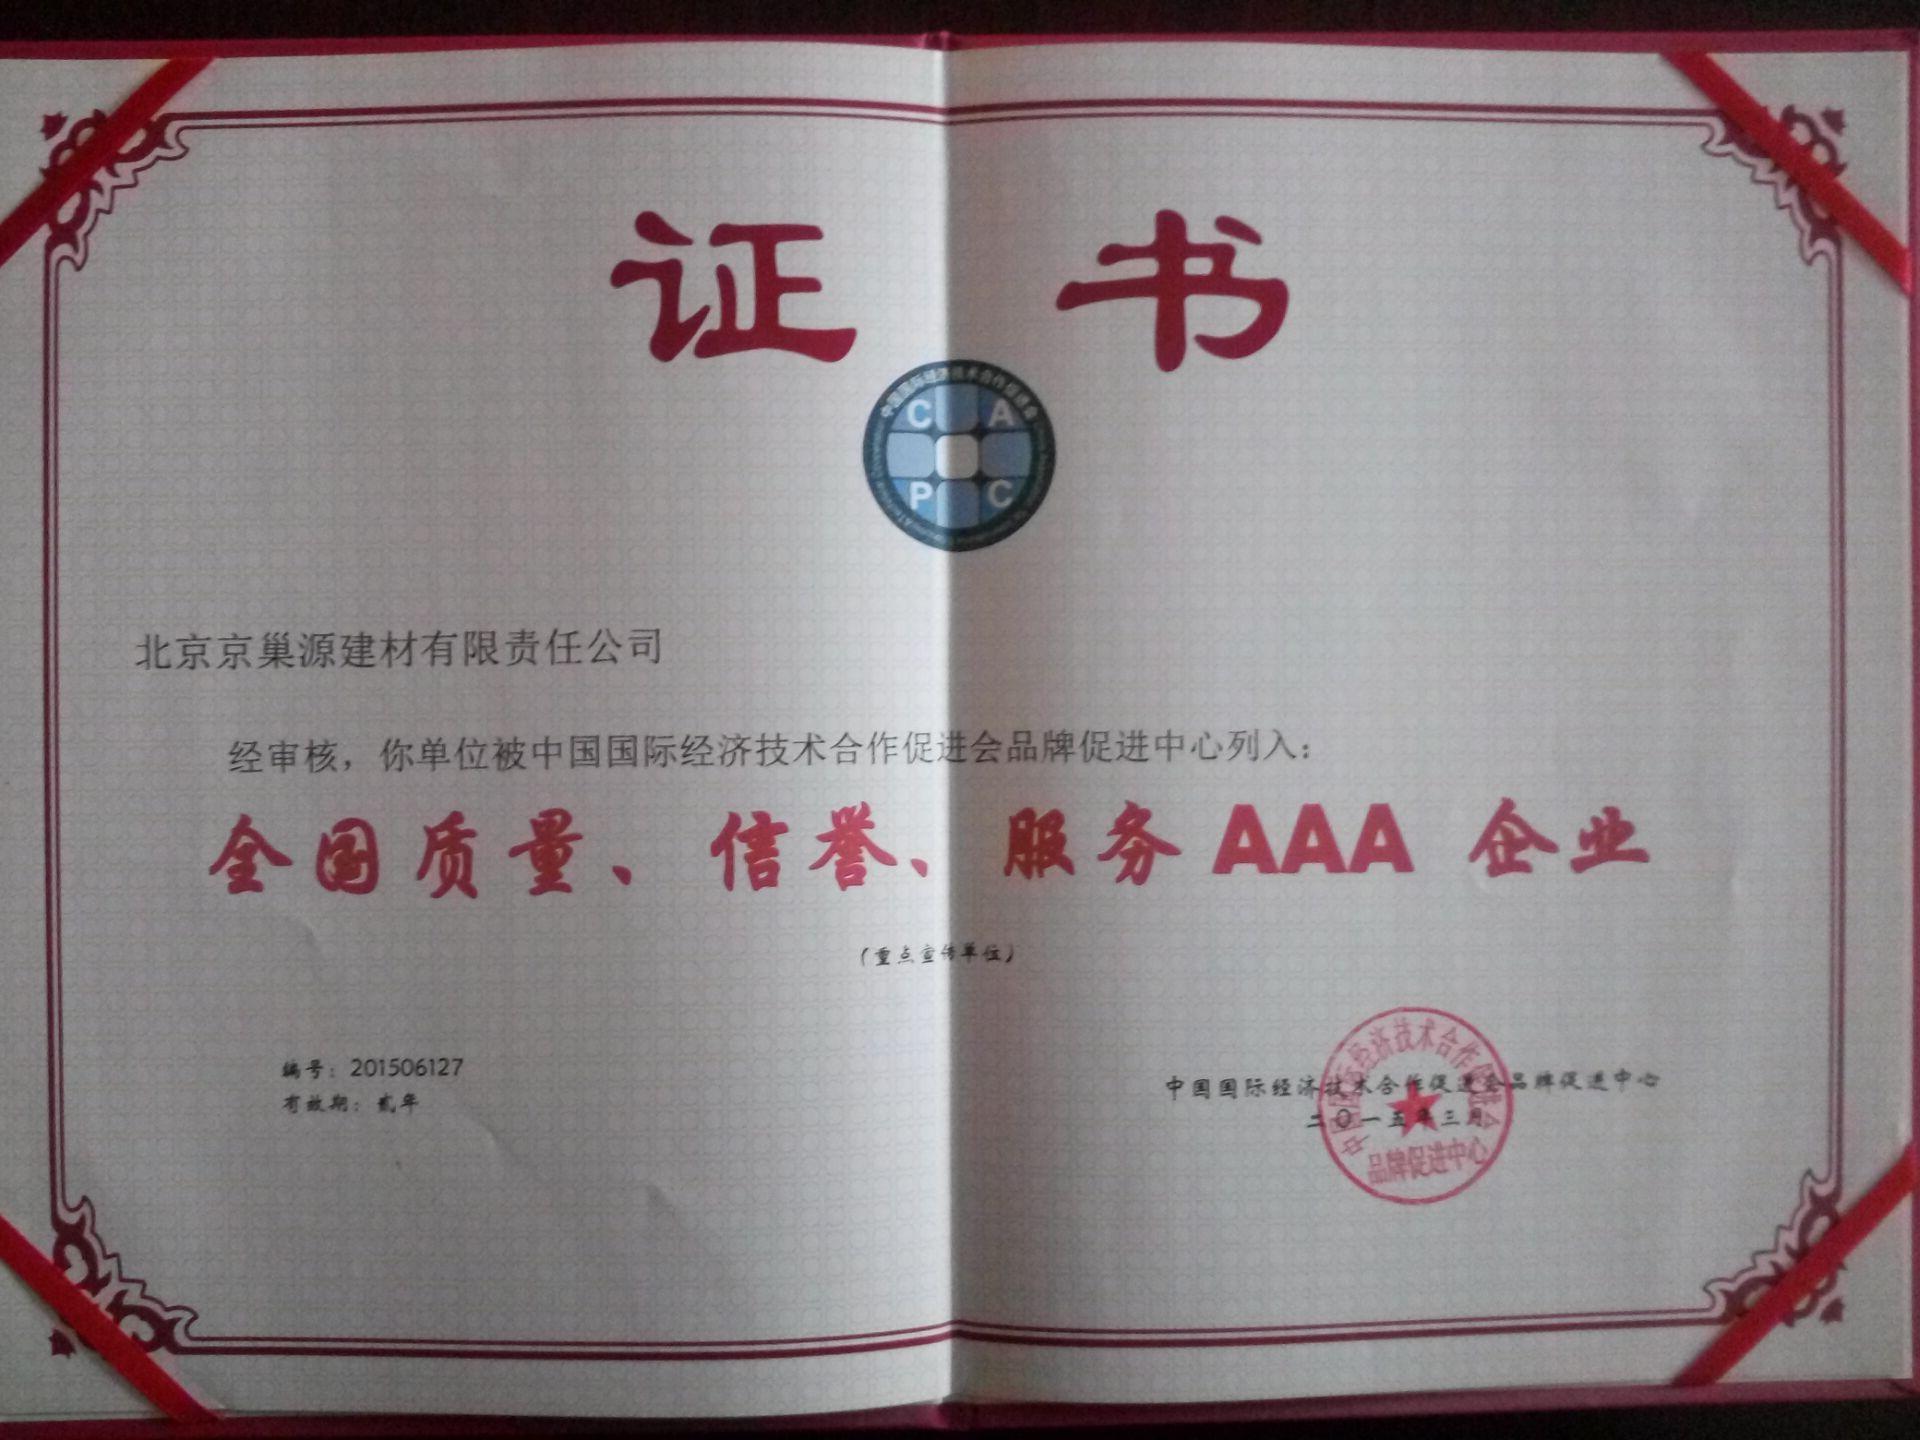 AAA级企业认证